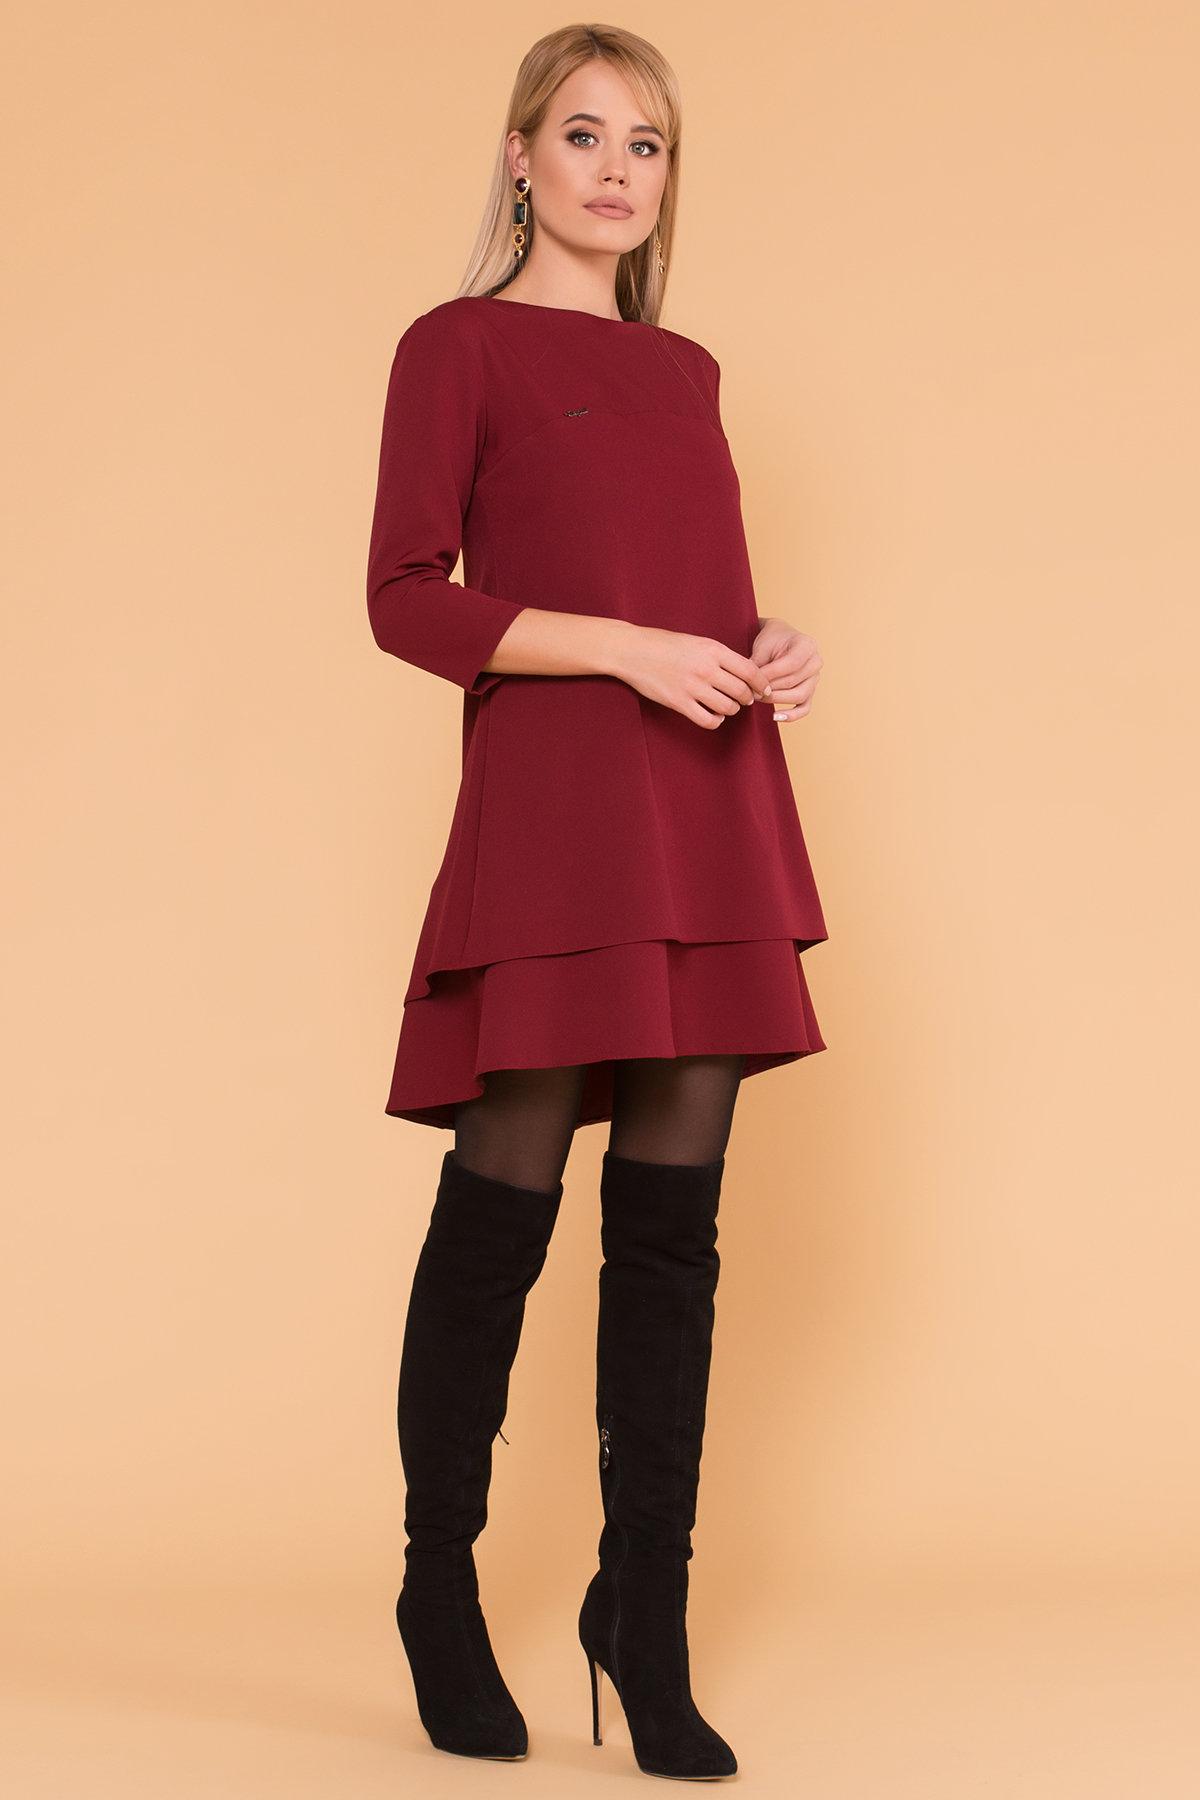 Платье Делафер 3245 Цвет: Марсала